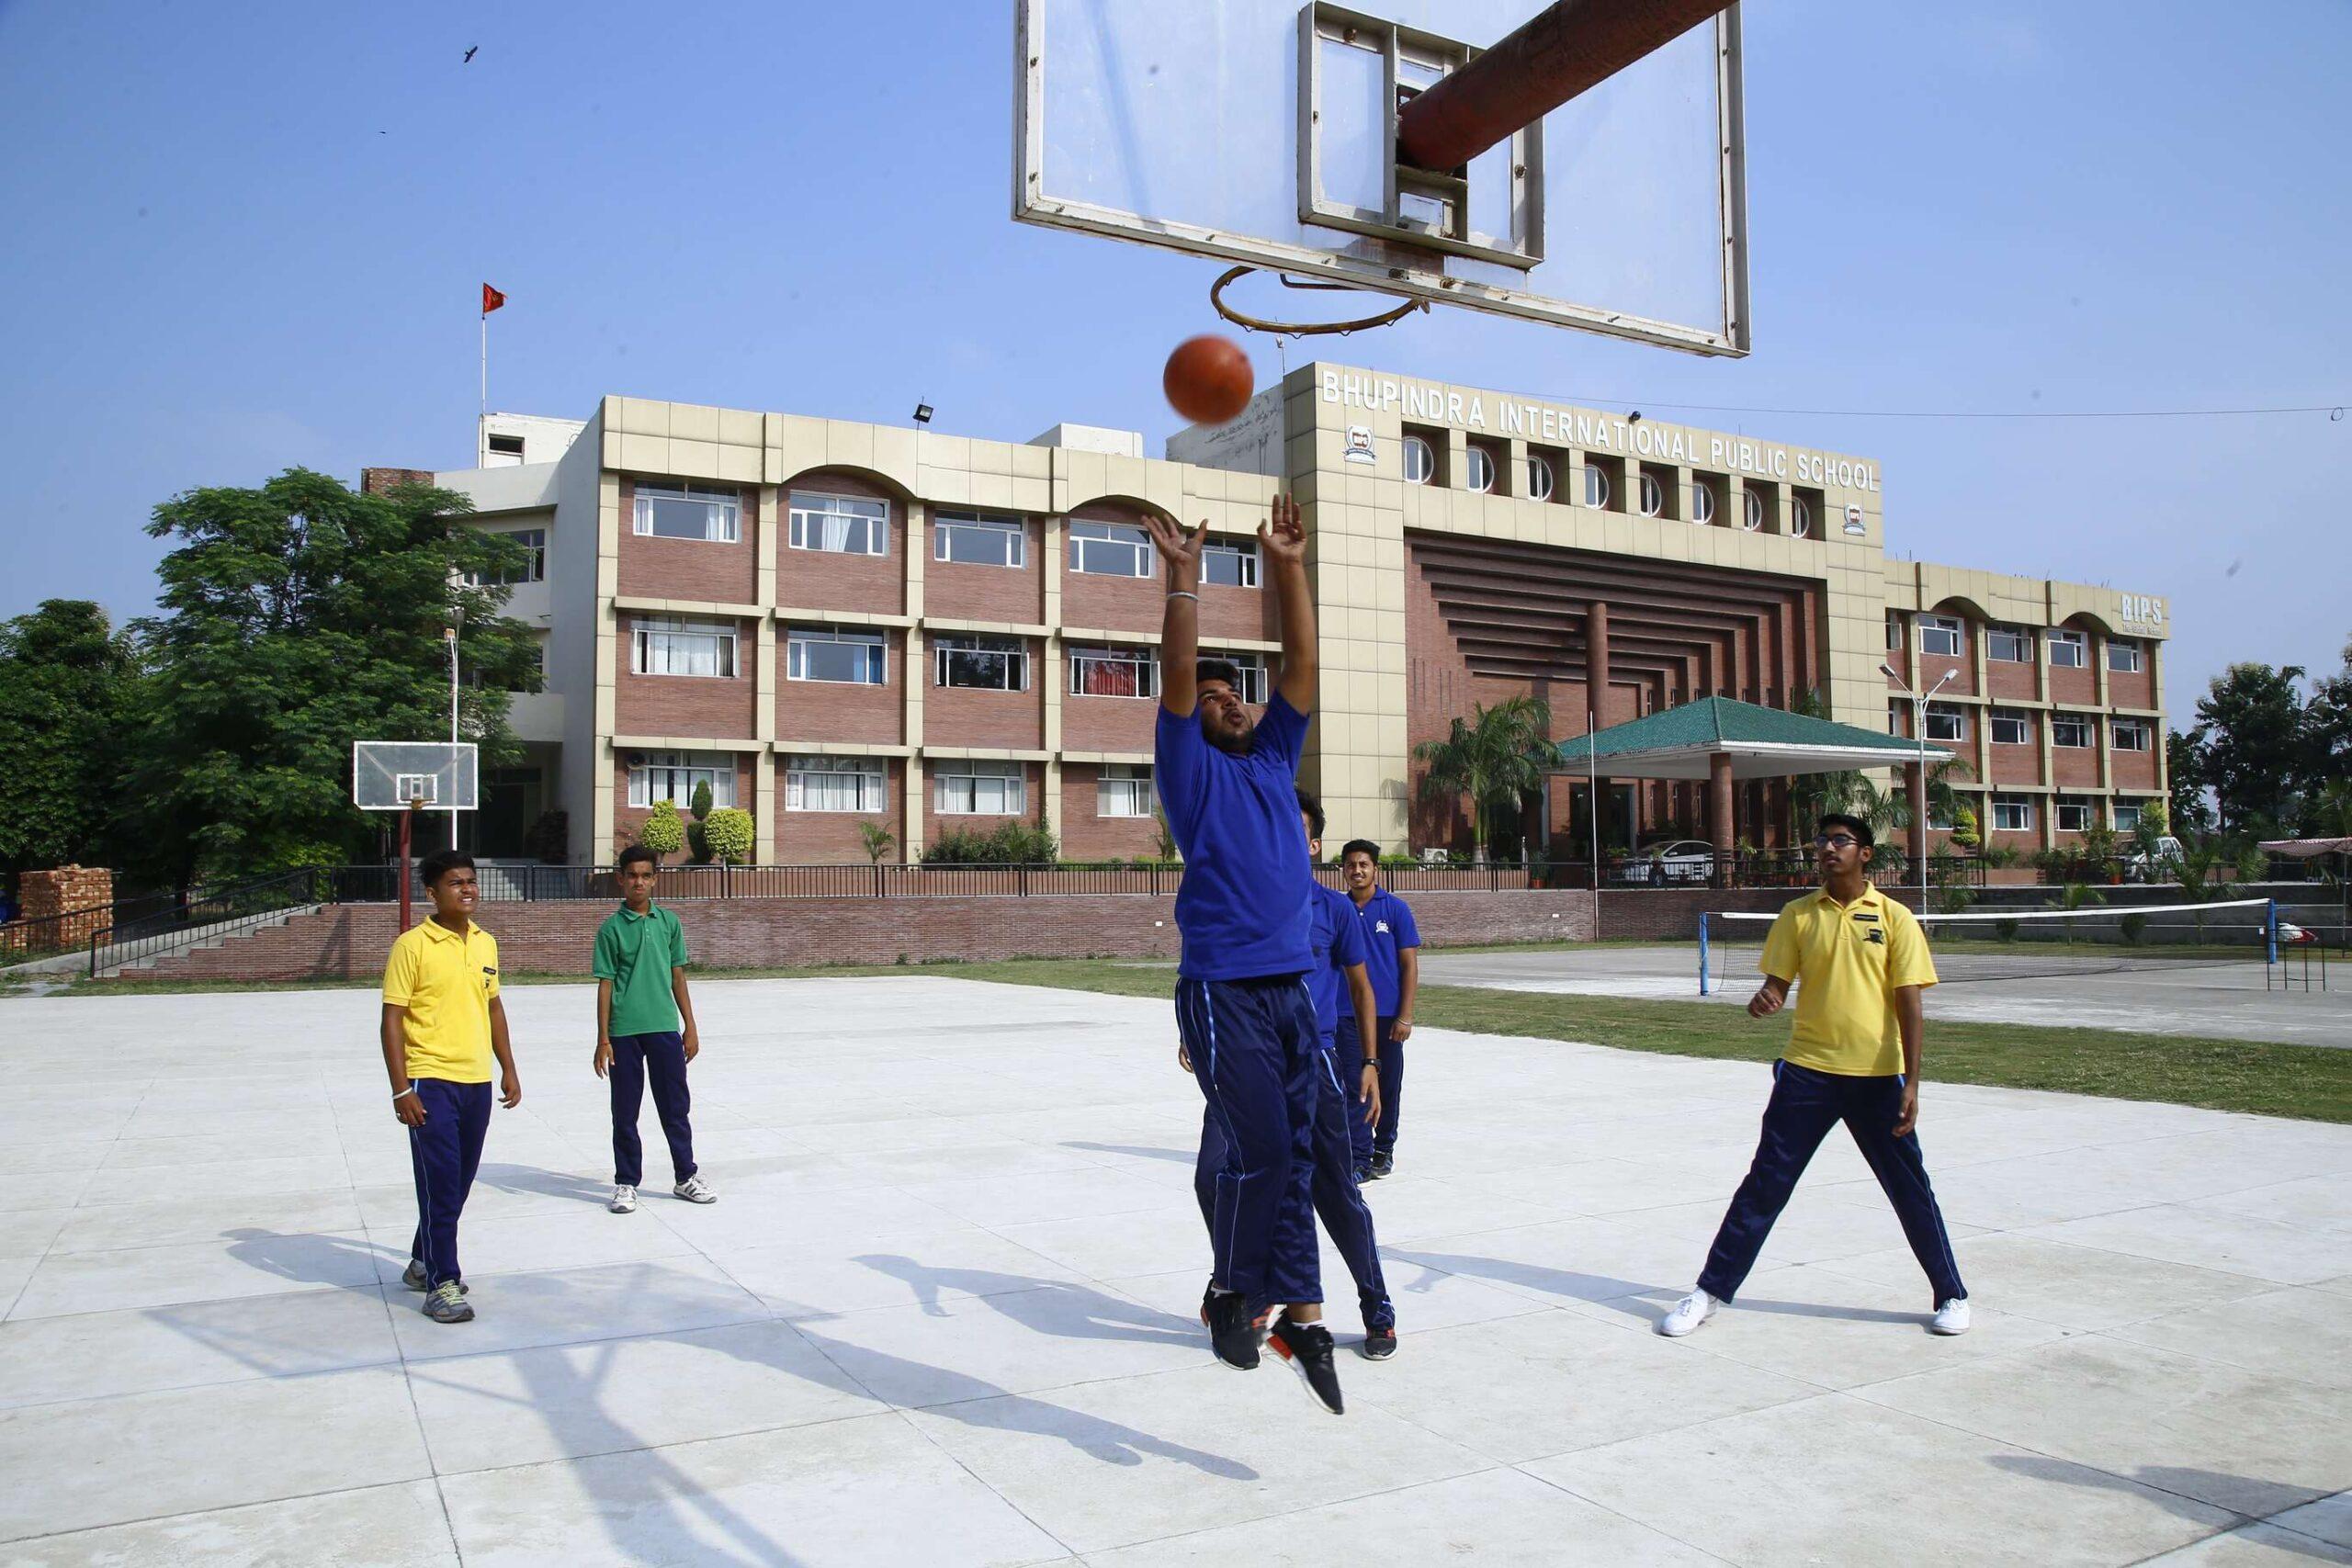 Basket ball practice